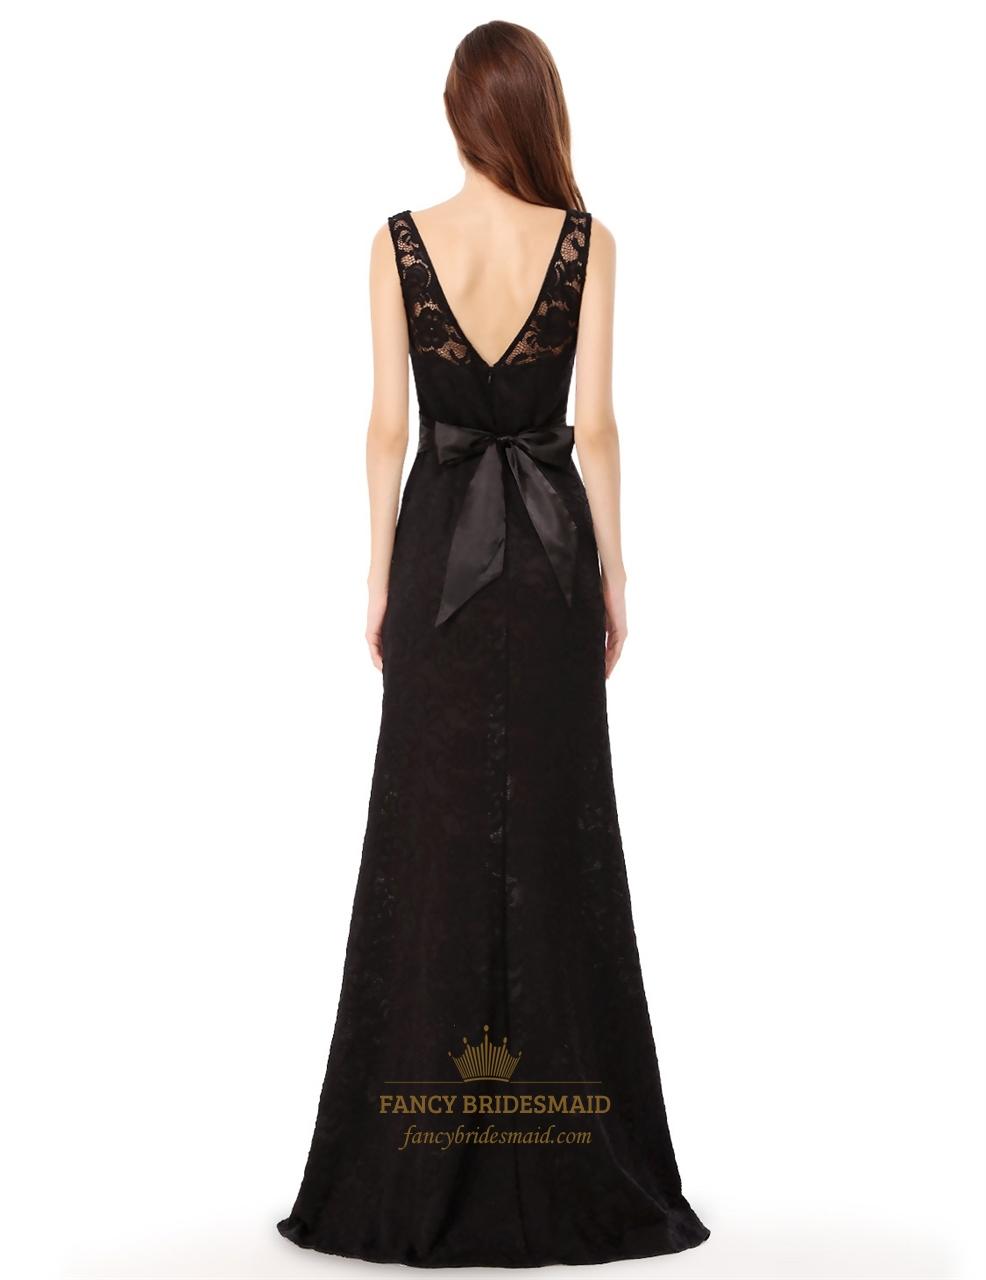 v back sleeveless lace evening dress side spilt with